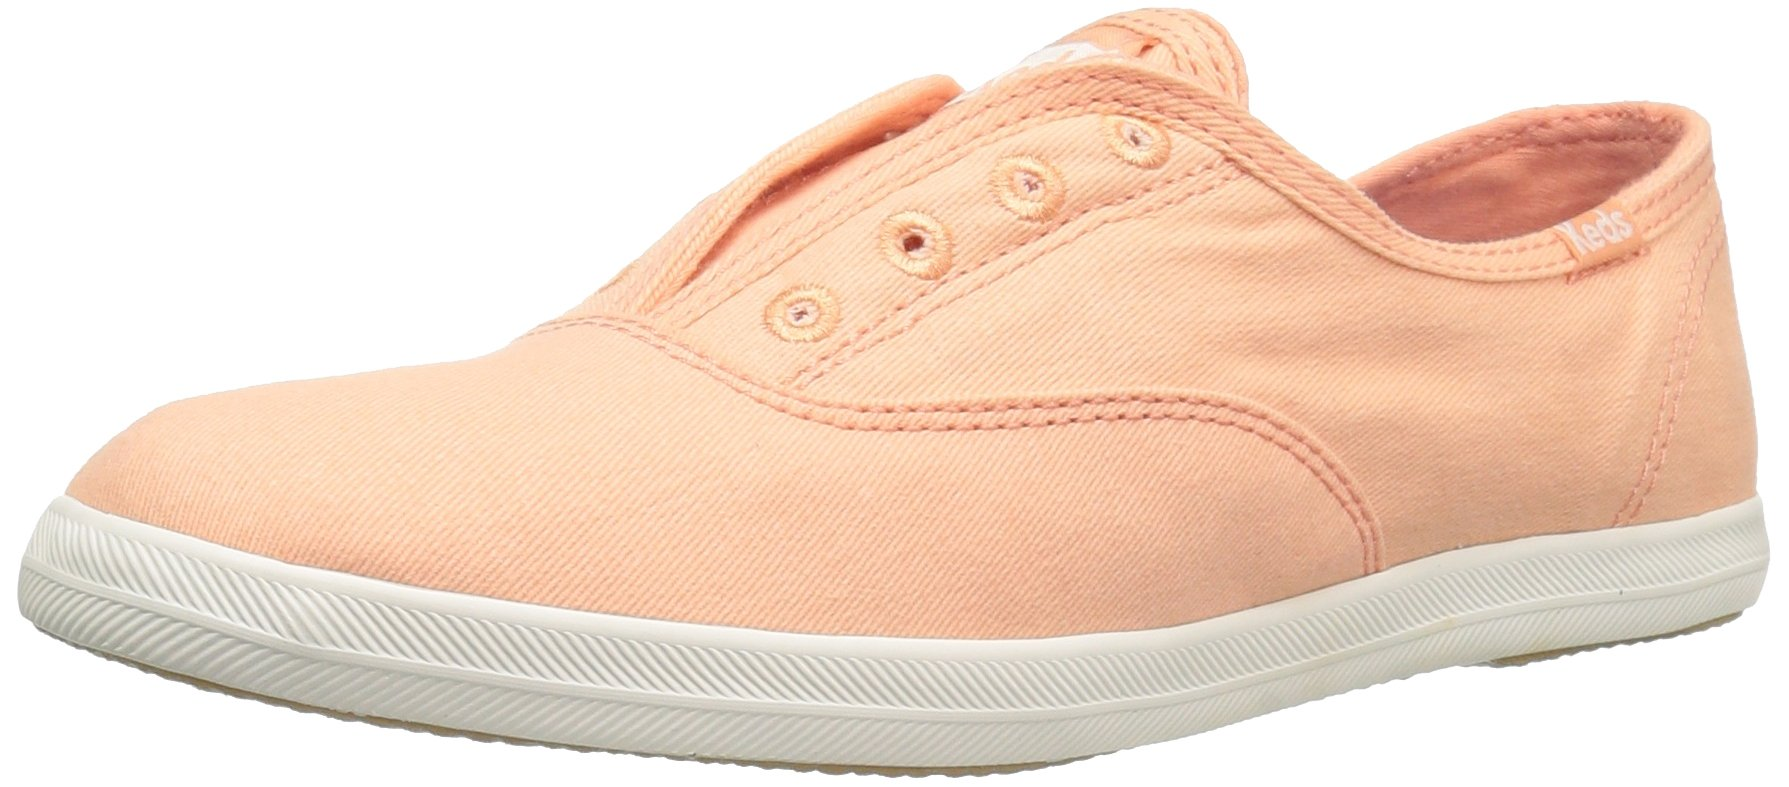 Keds Women's Chillax Fashion Sneaker, Peach Pink, 10 M US